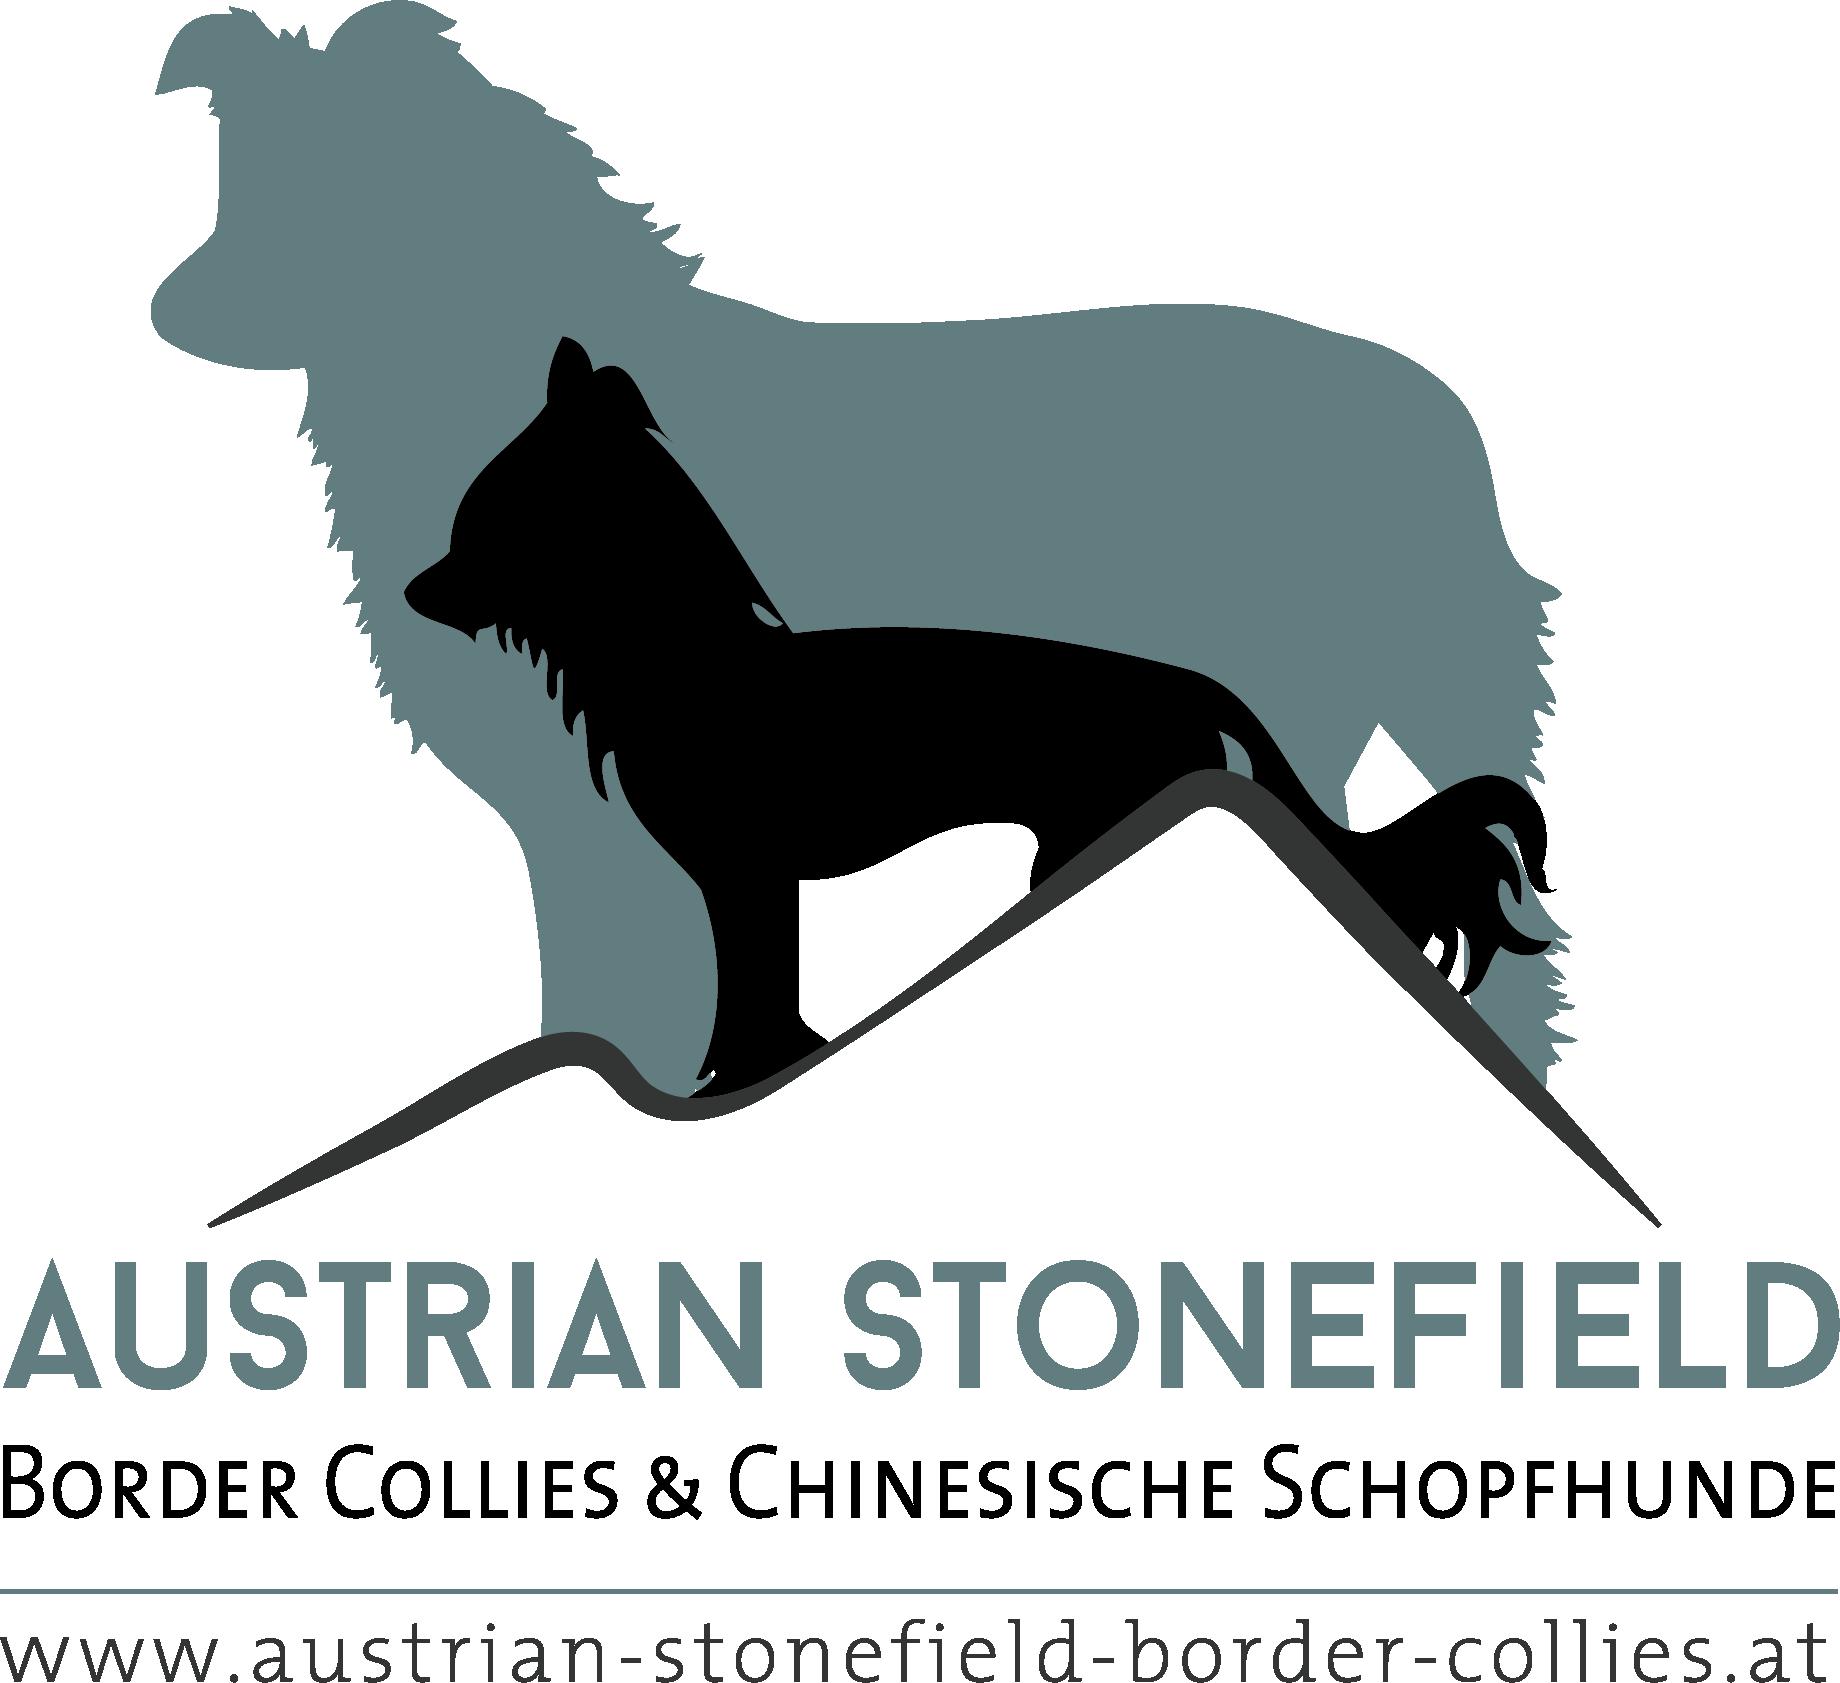 AUSTRIAN STONEFIELD